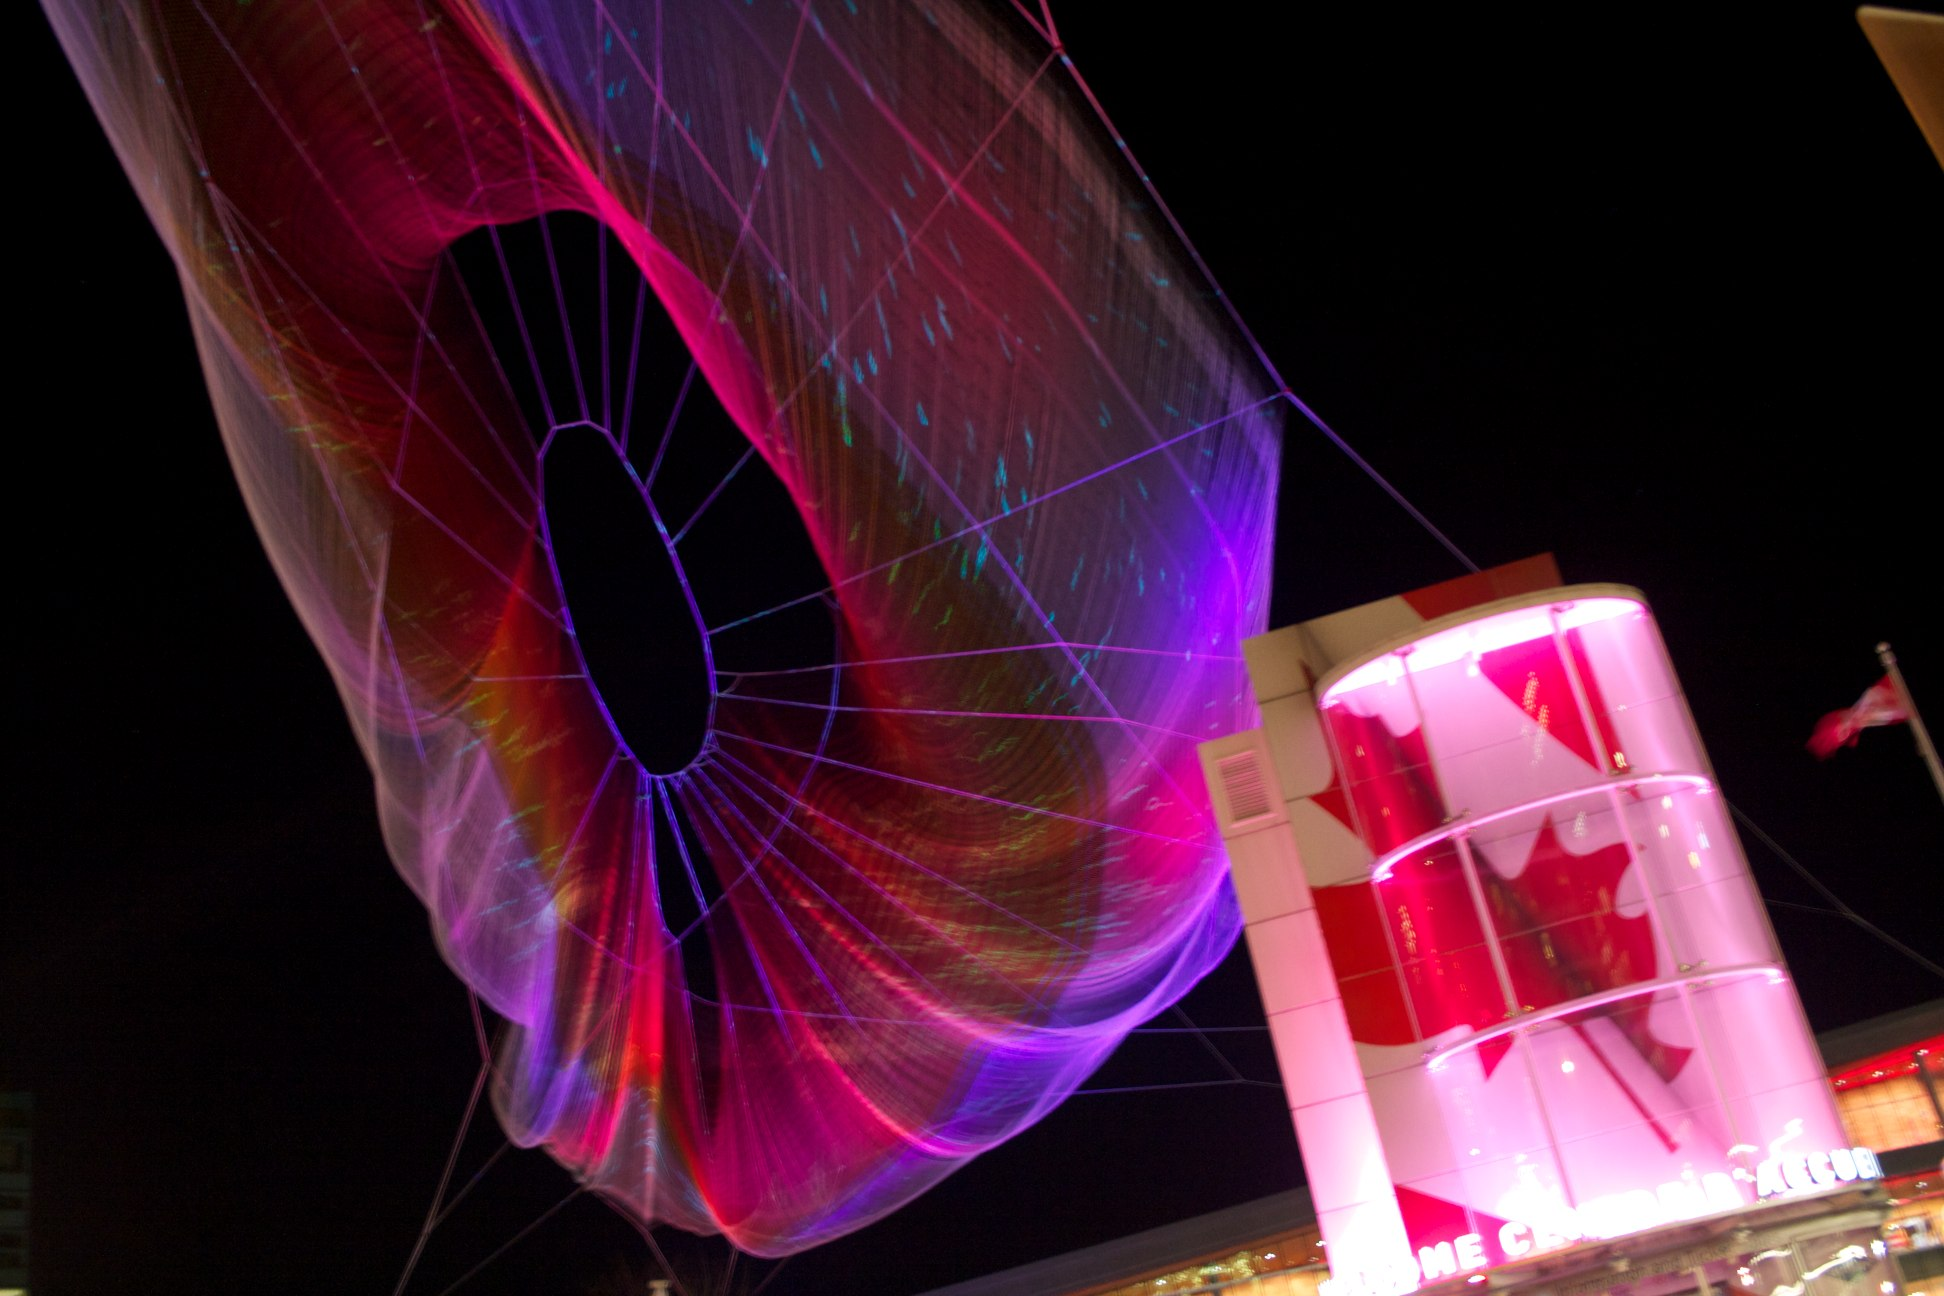 _MG_6652  Janet Echelman aerial sculpture. sculpture, art, vancouver, downtown, illuminated. buy photo